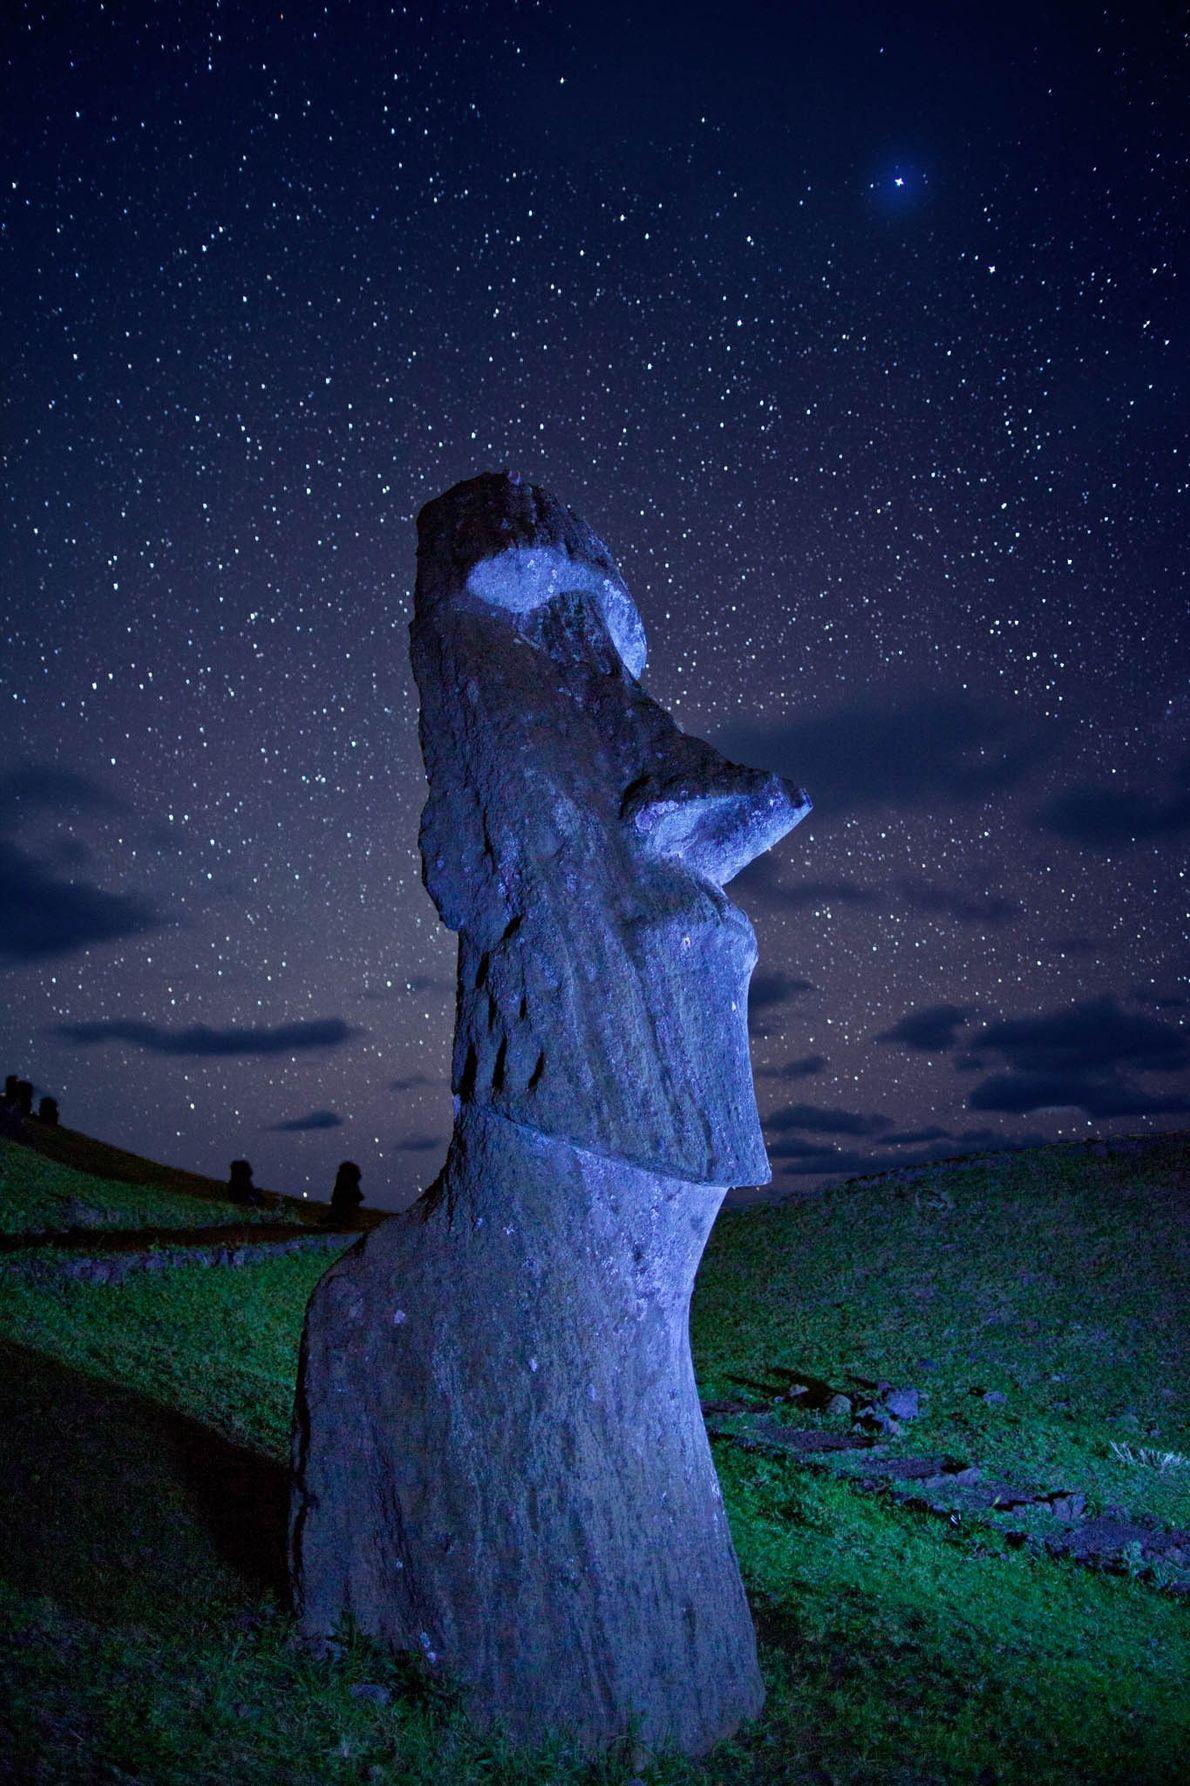 An ancient moai statue guards a hillside on Easter Island.